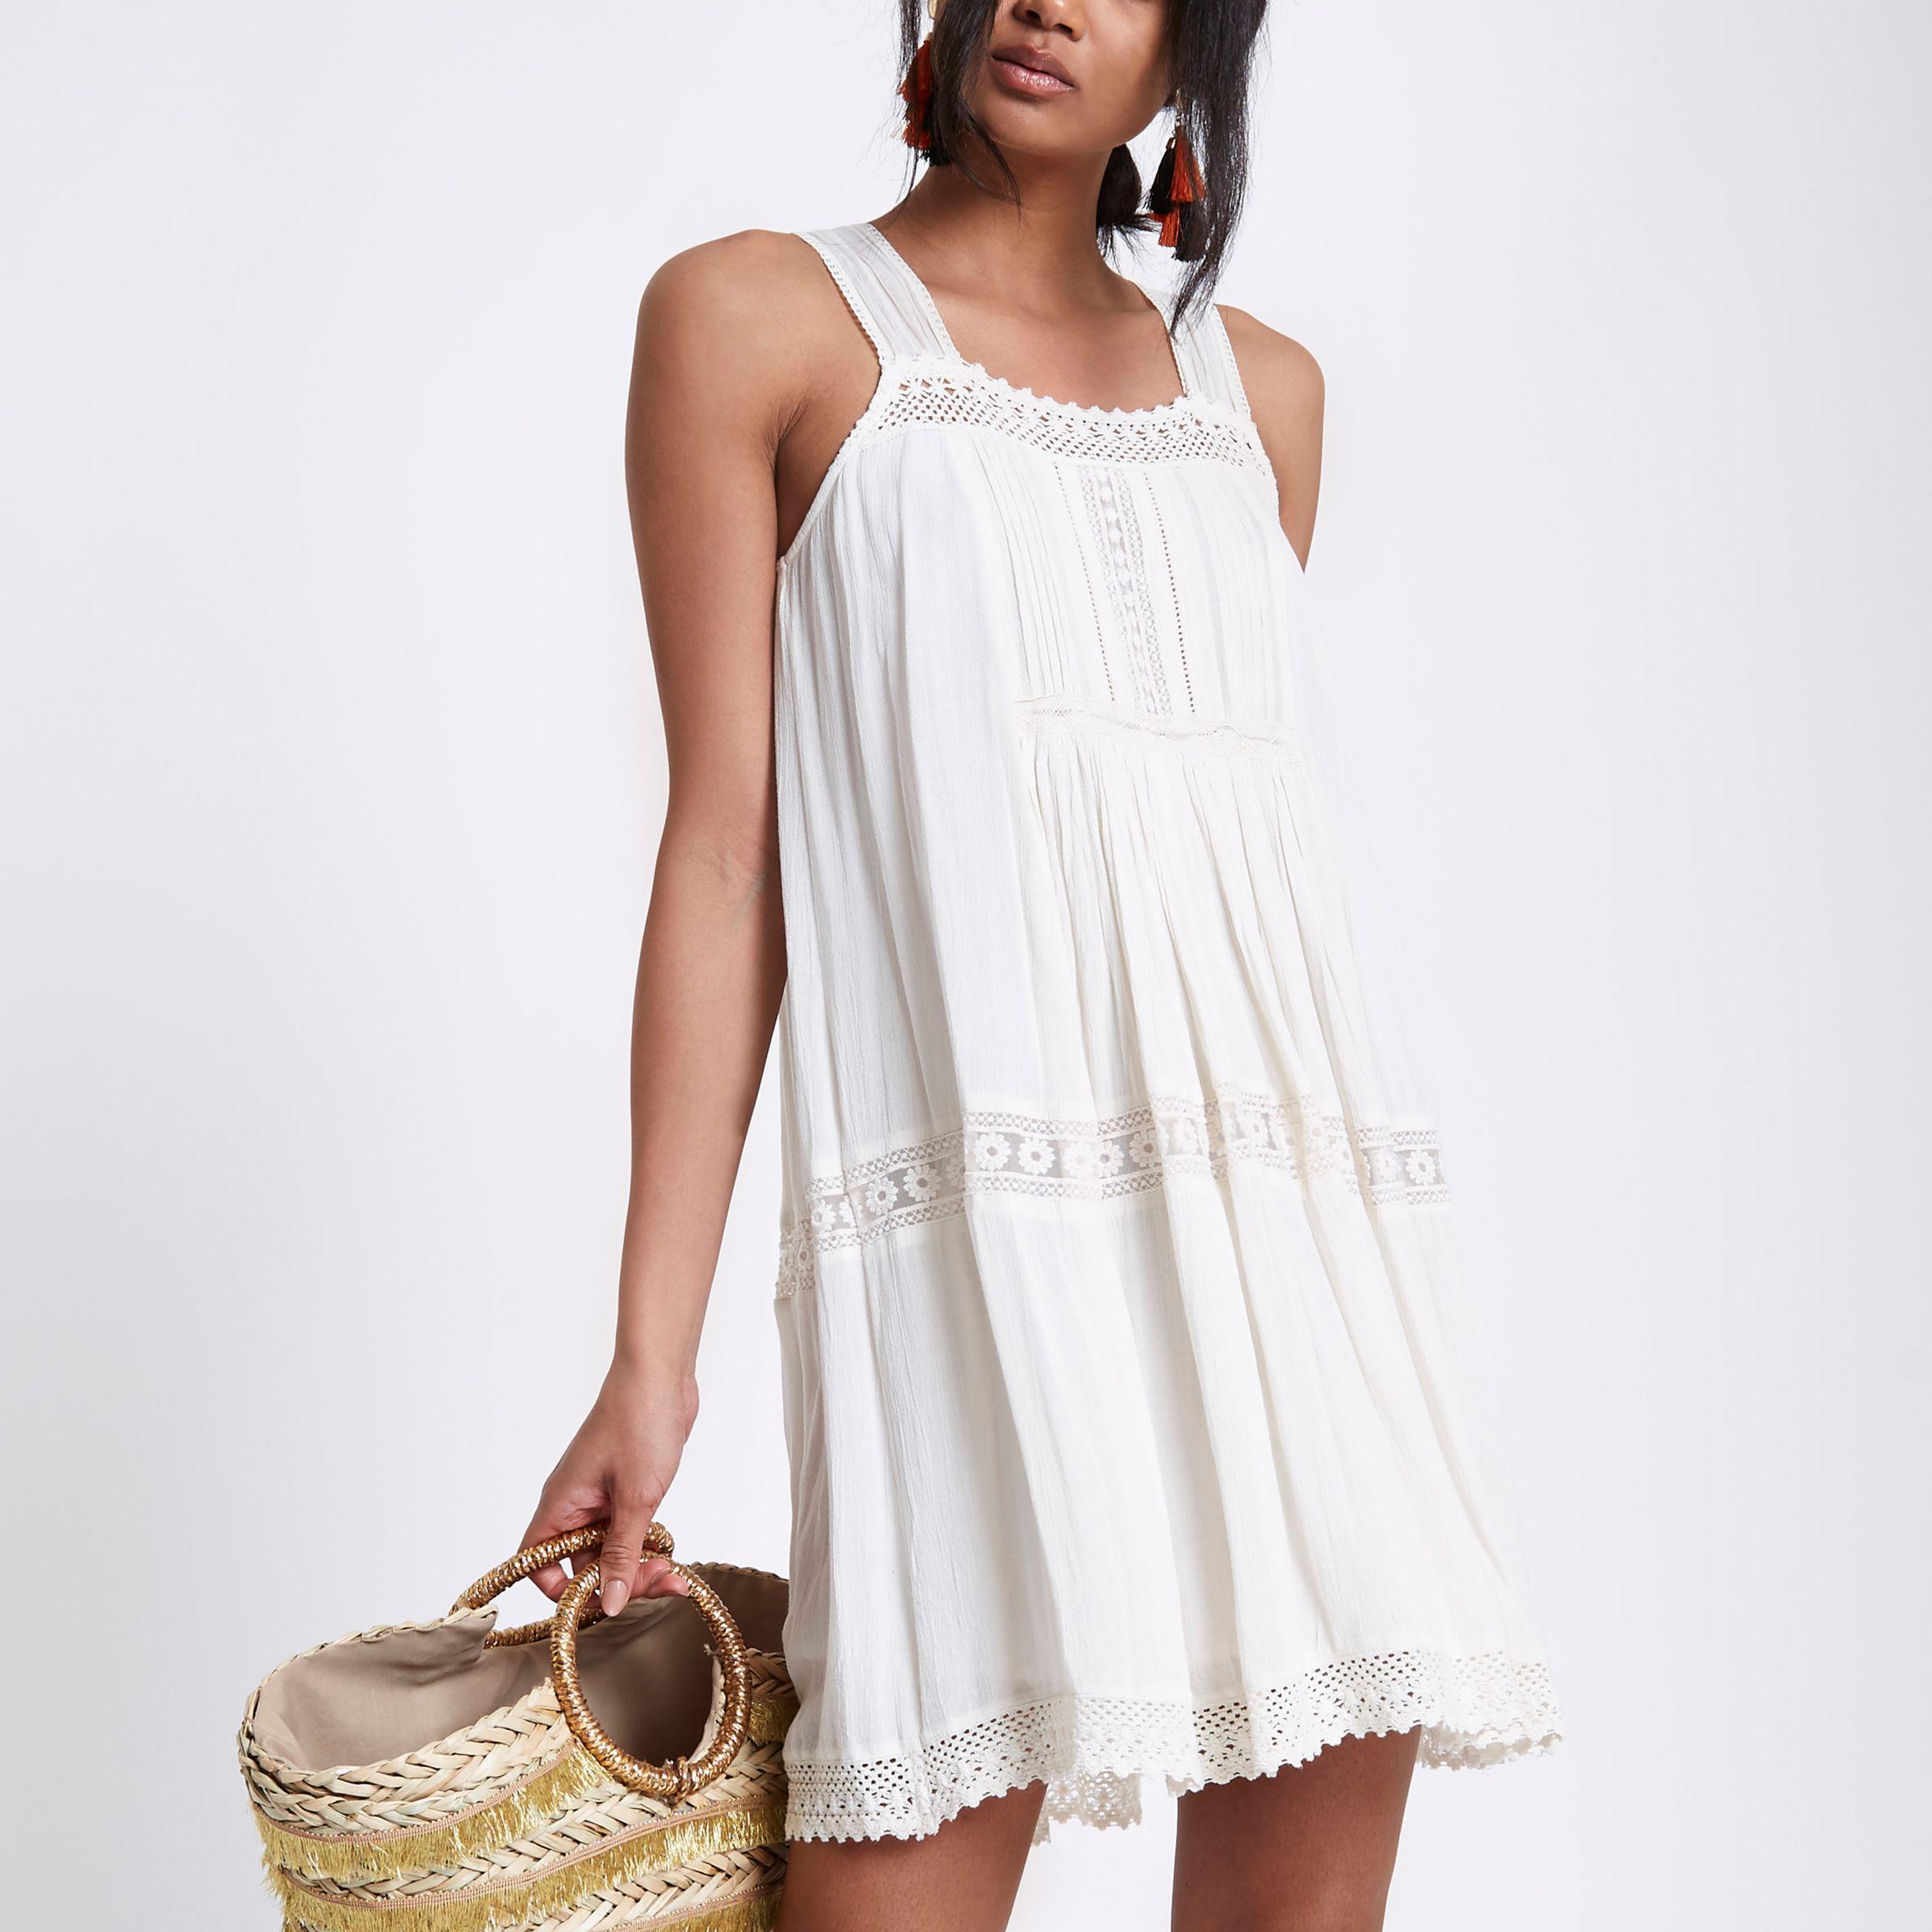 8b2cb28ec7af Lyst - River Island Cream Lace Open Back Swing Dress in Natural